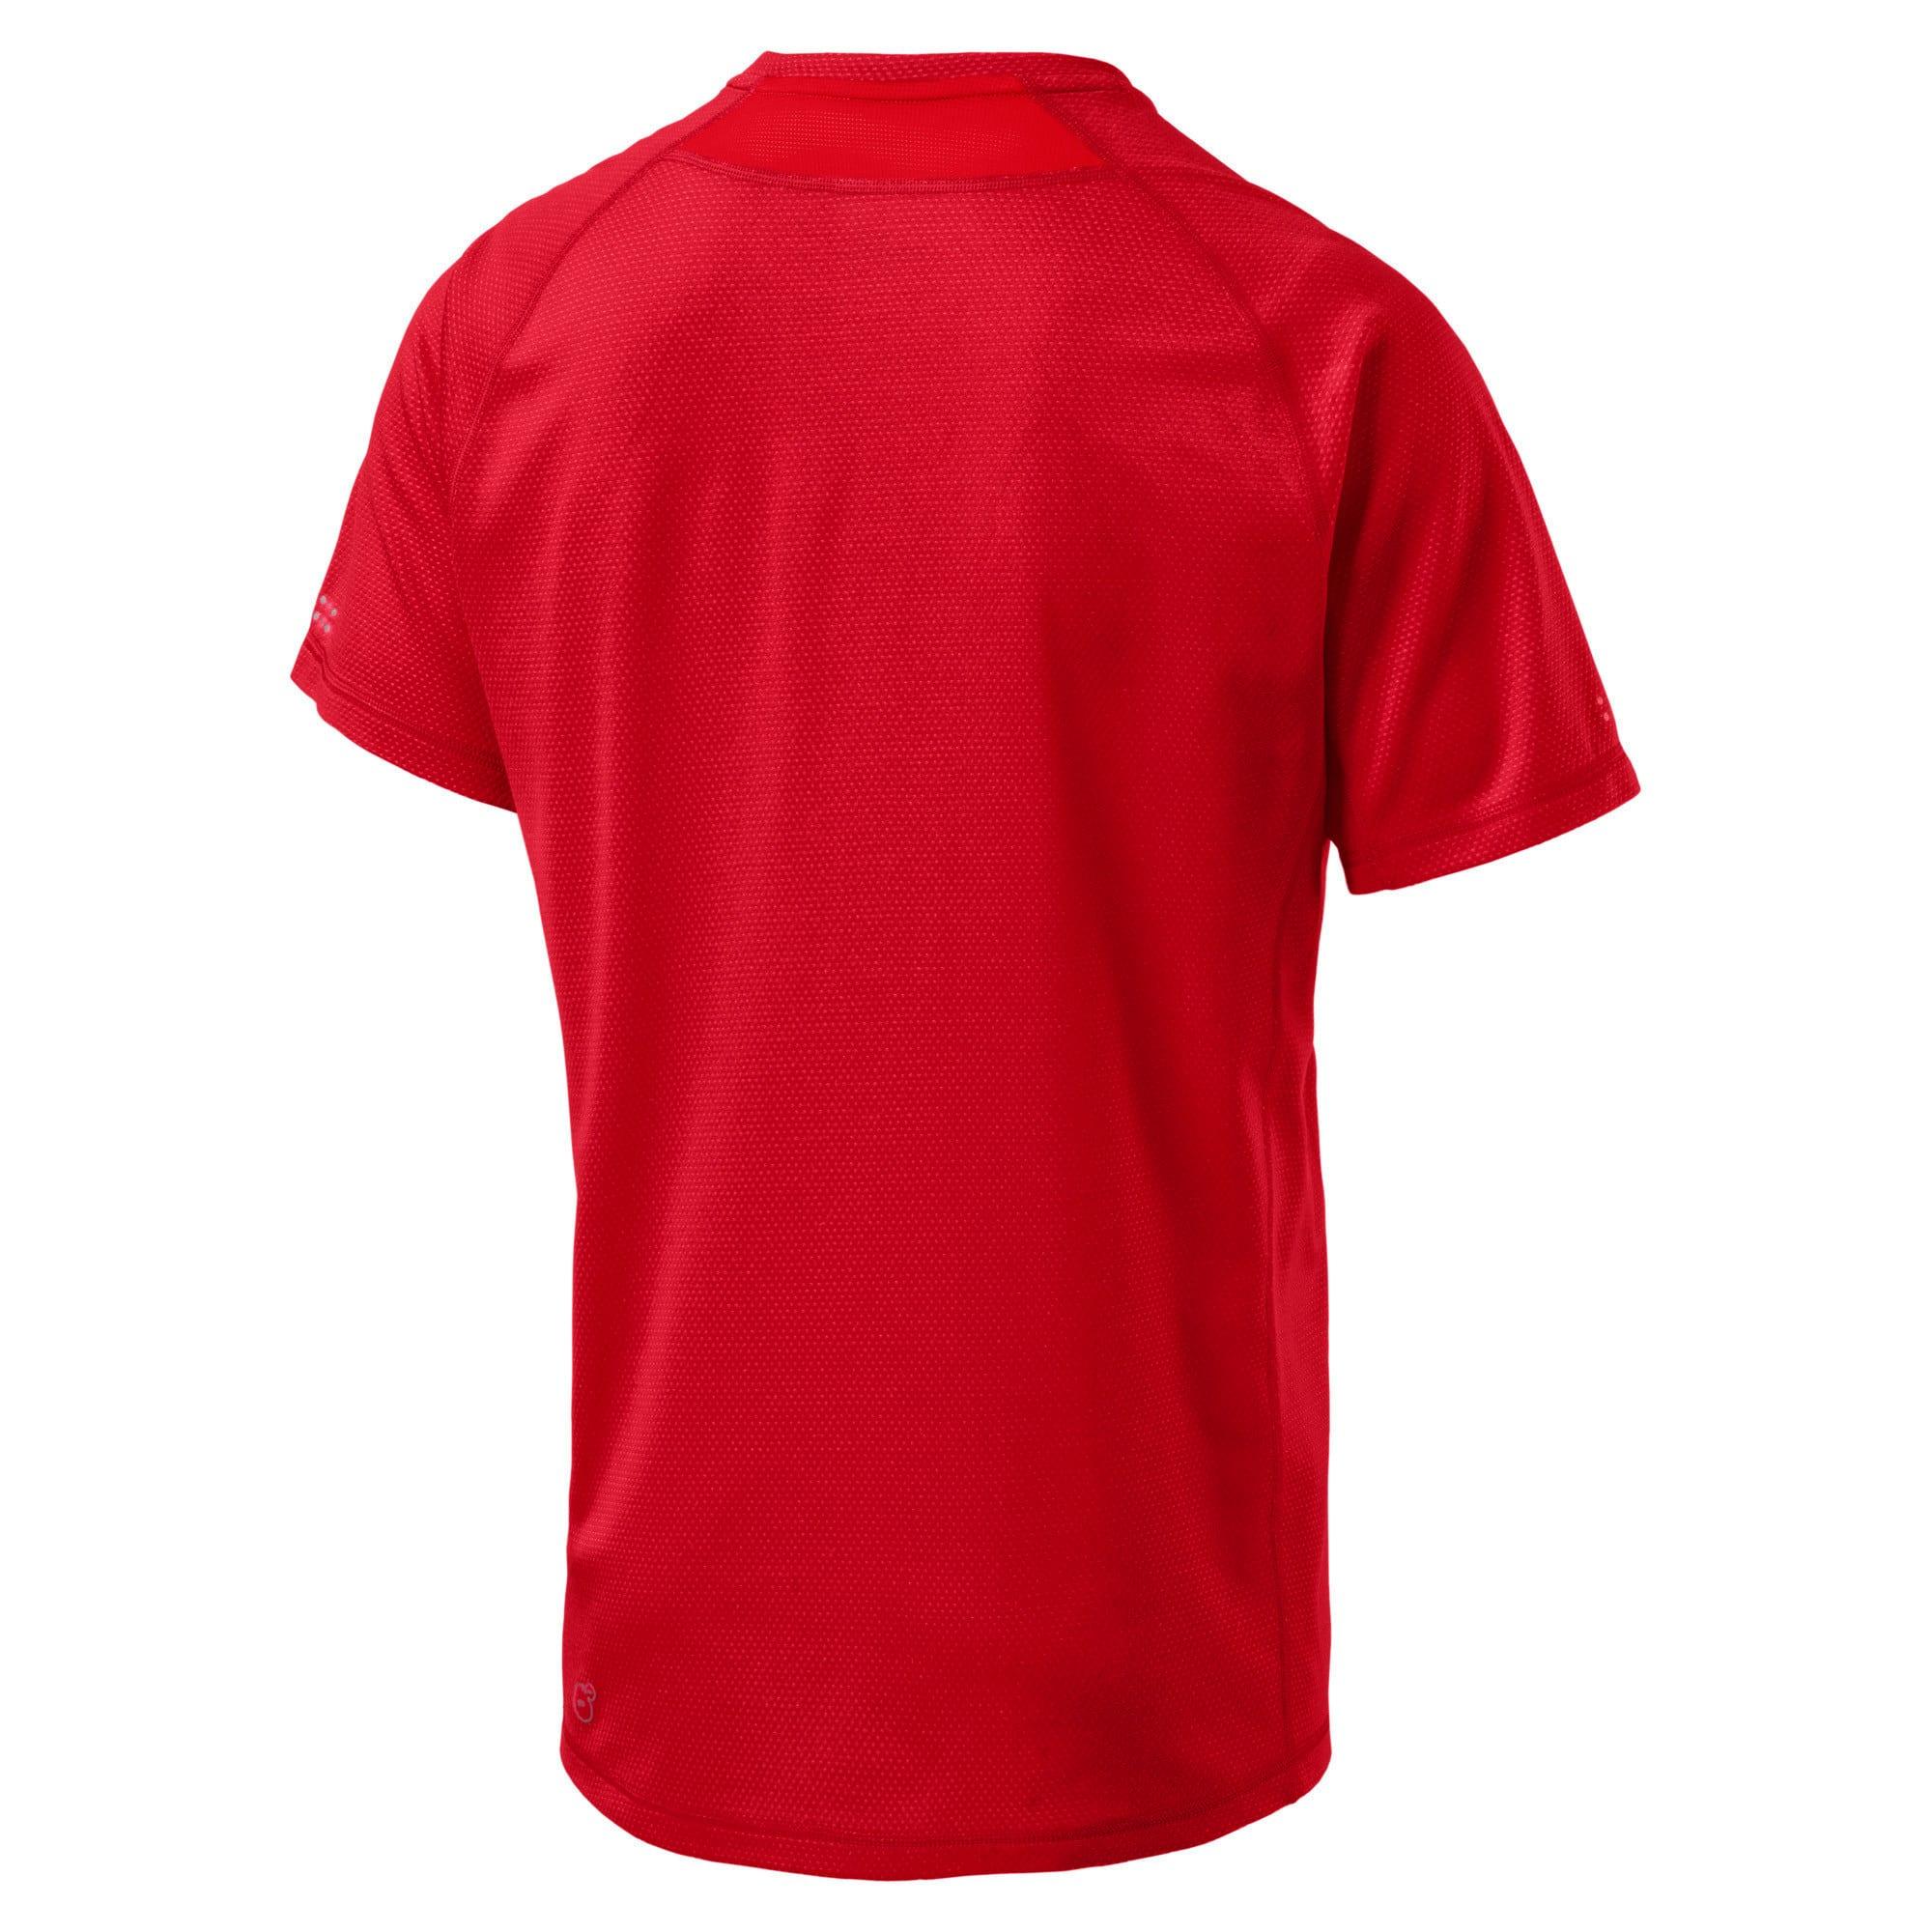 Thumbnail 3 of PWRRUN AdapThermo-R Men's Short Sleeve Running T-Shirt, Flame Scarlet, medium-IND